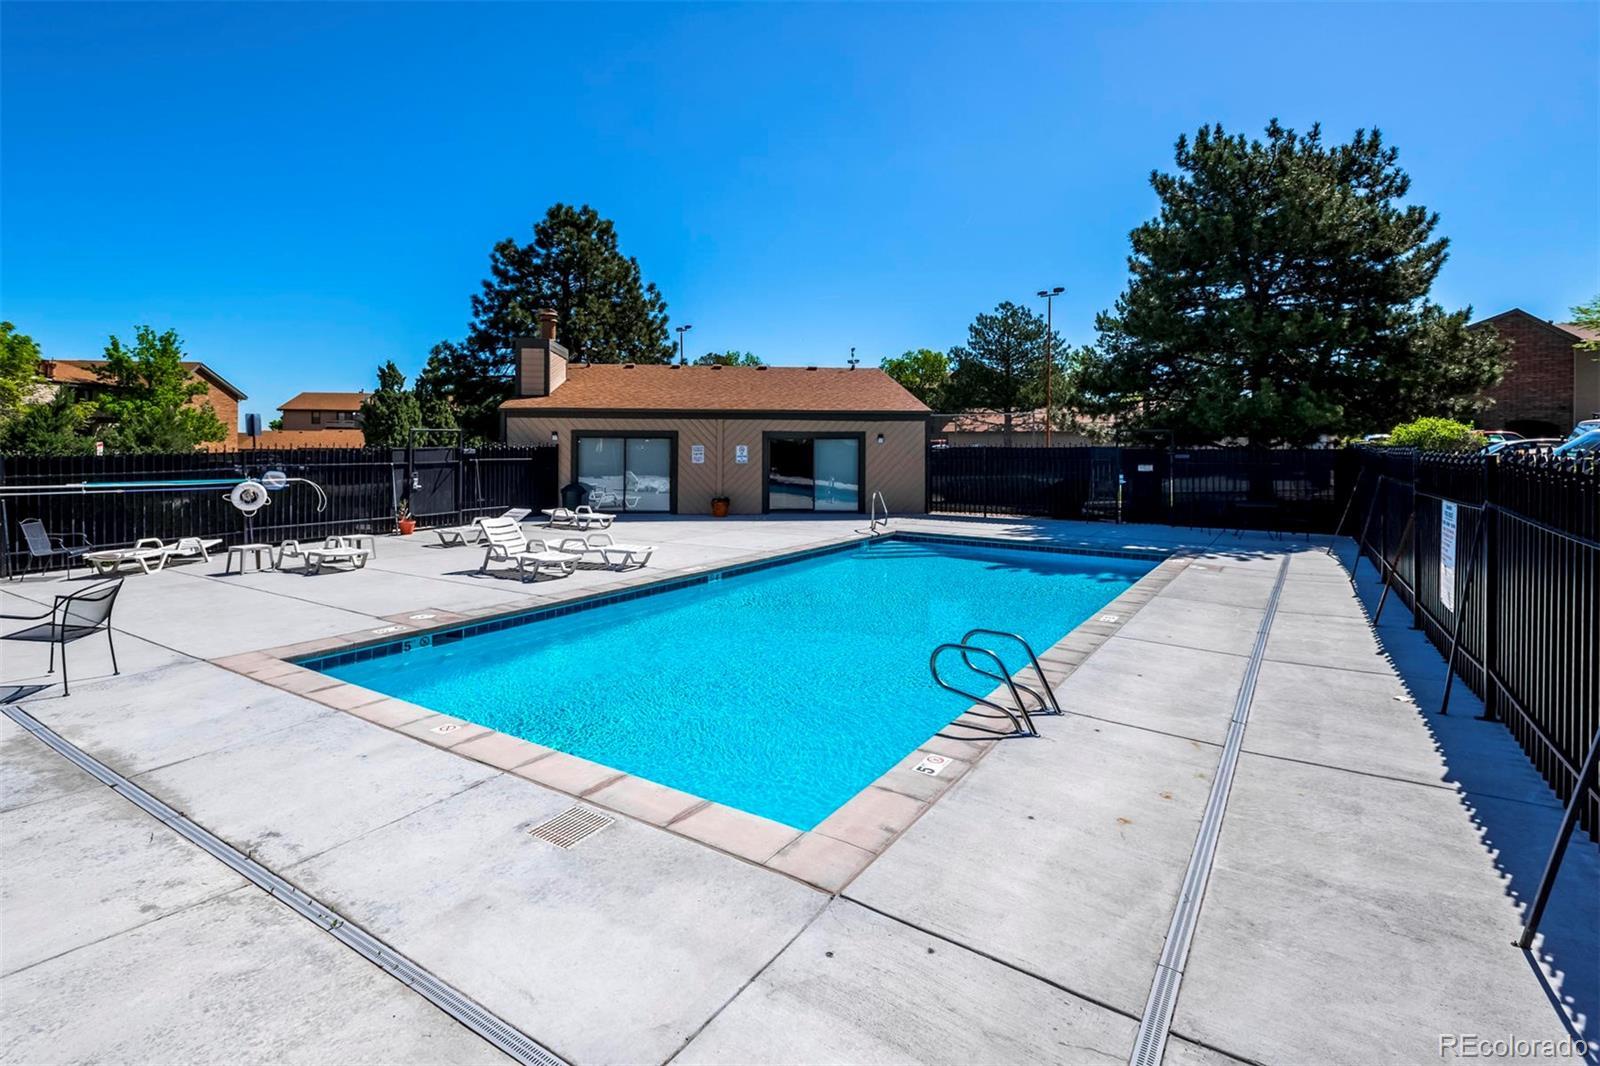 MLS# 6340316 - 19 - 420 Zang Street #3-102, Lakewood, CO 80228